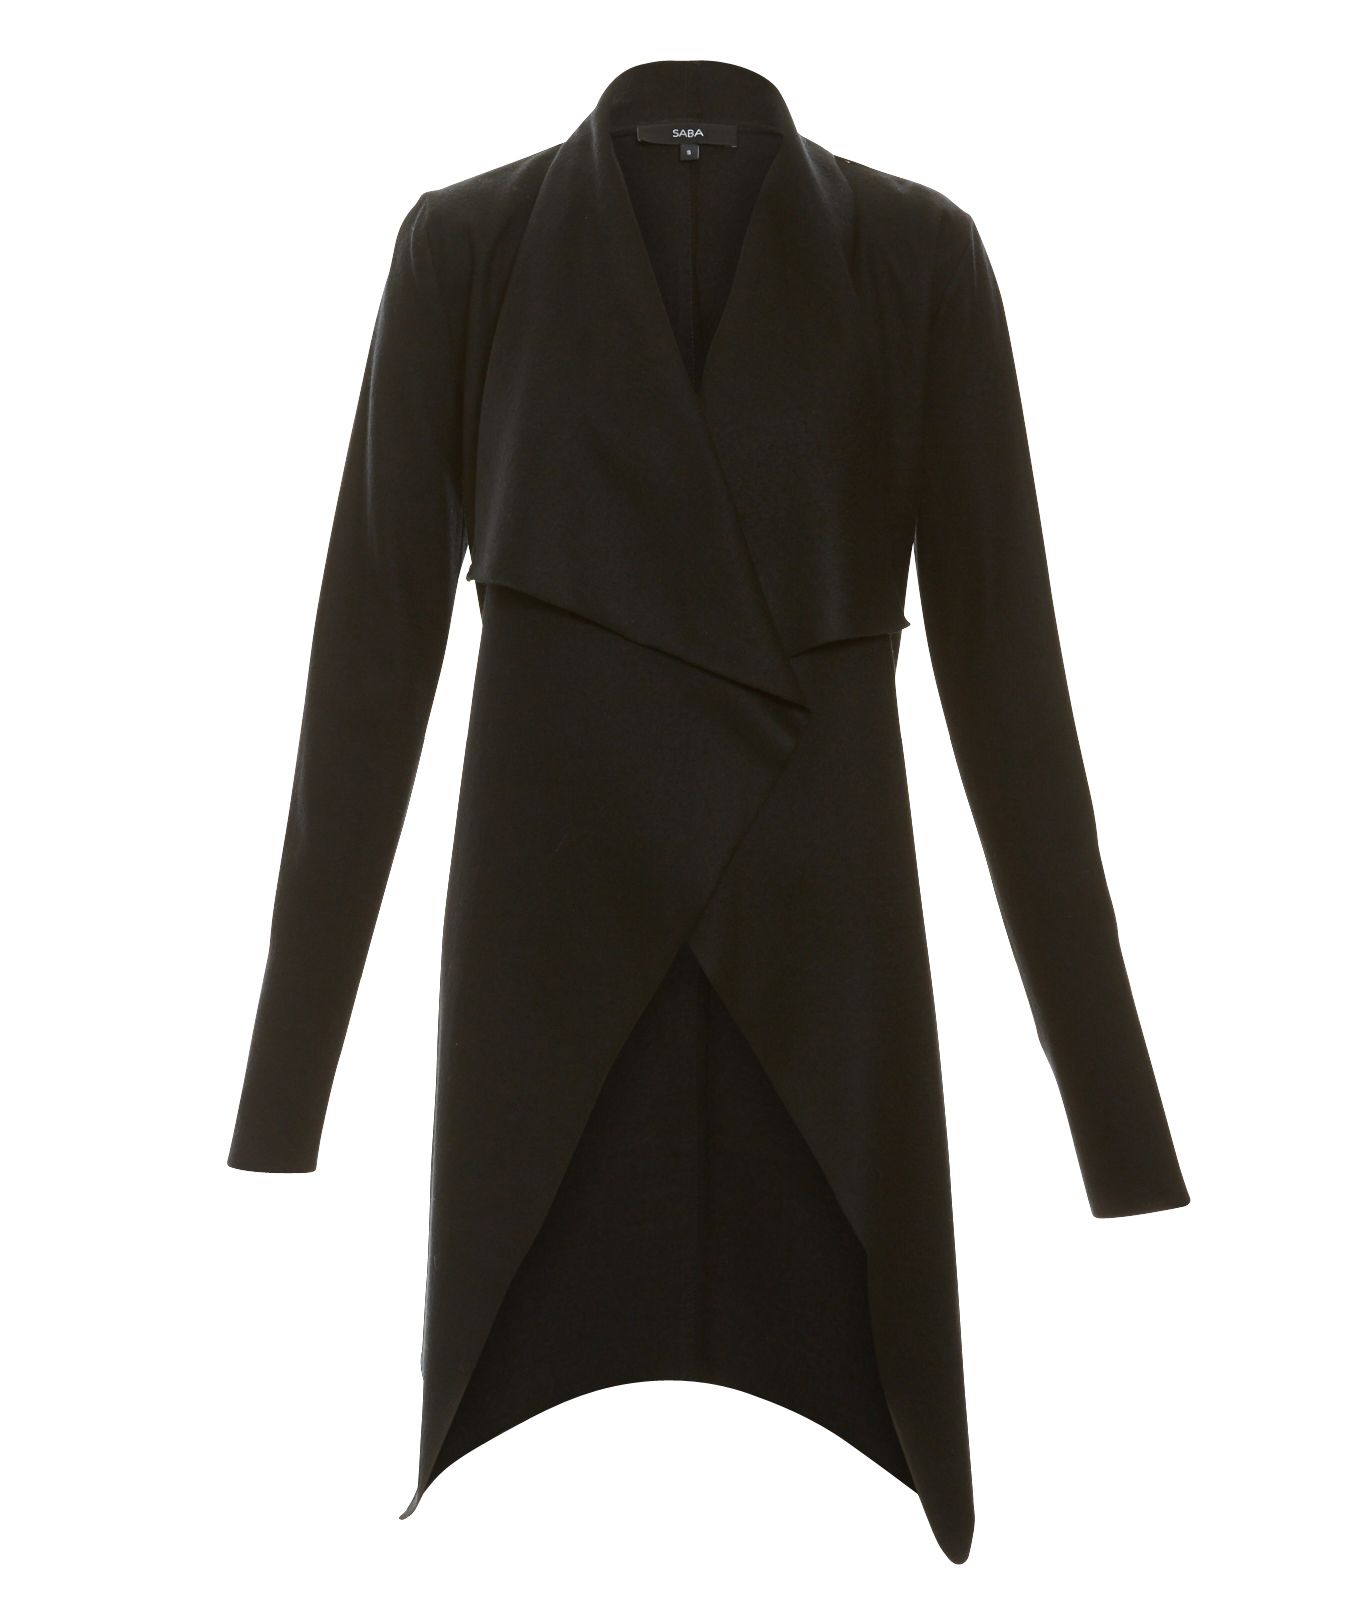 Karlie Knit Cardi 100% Merino Wool in Black  e33c9e62e